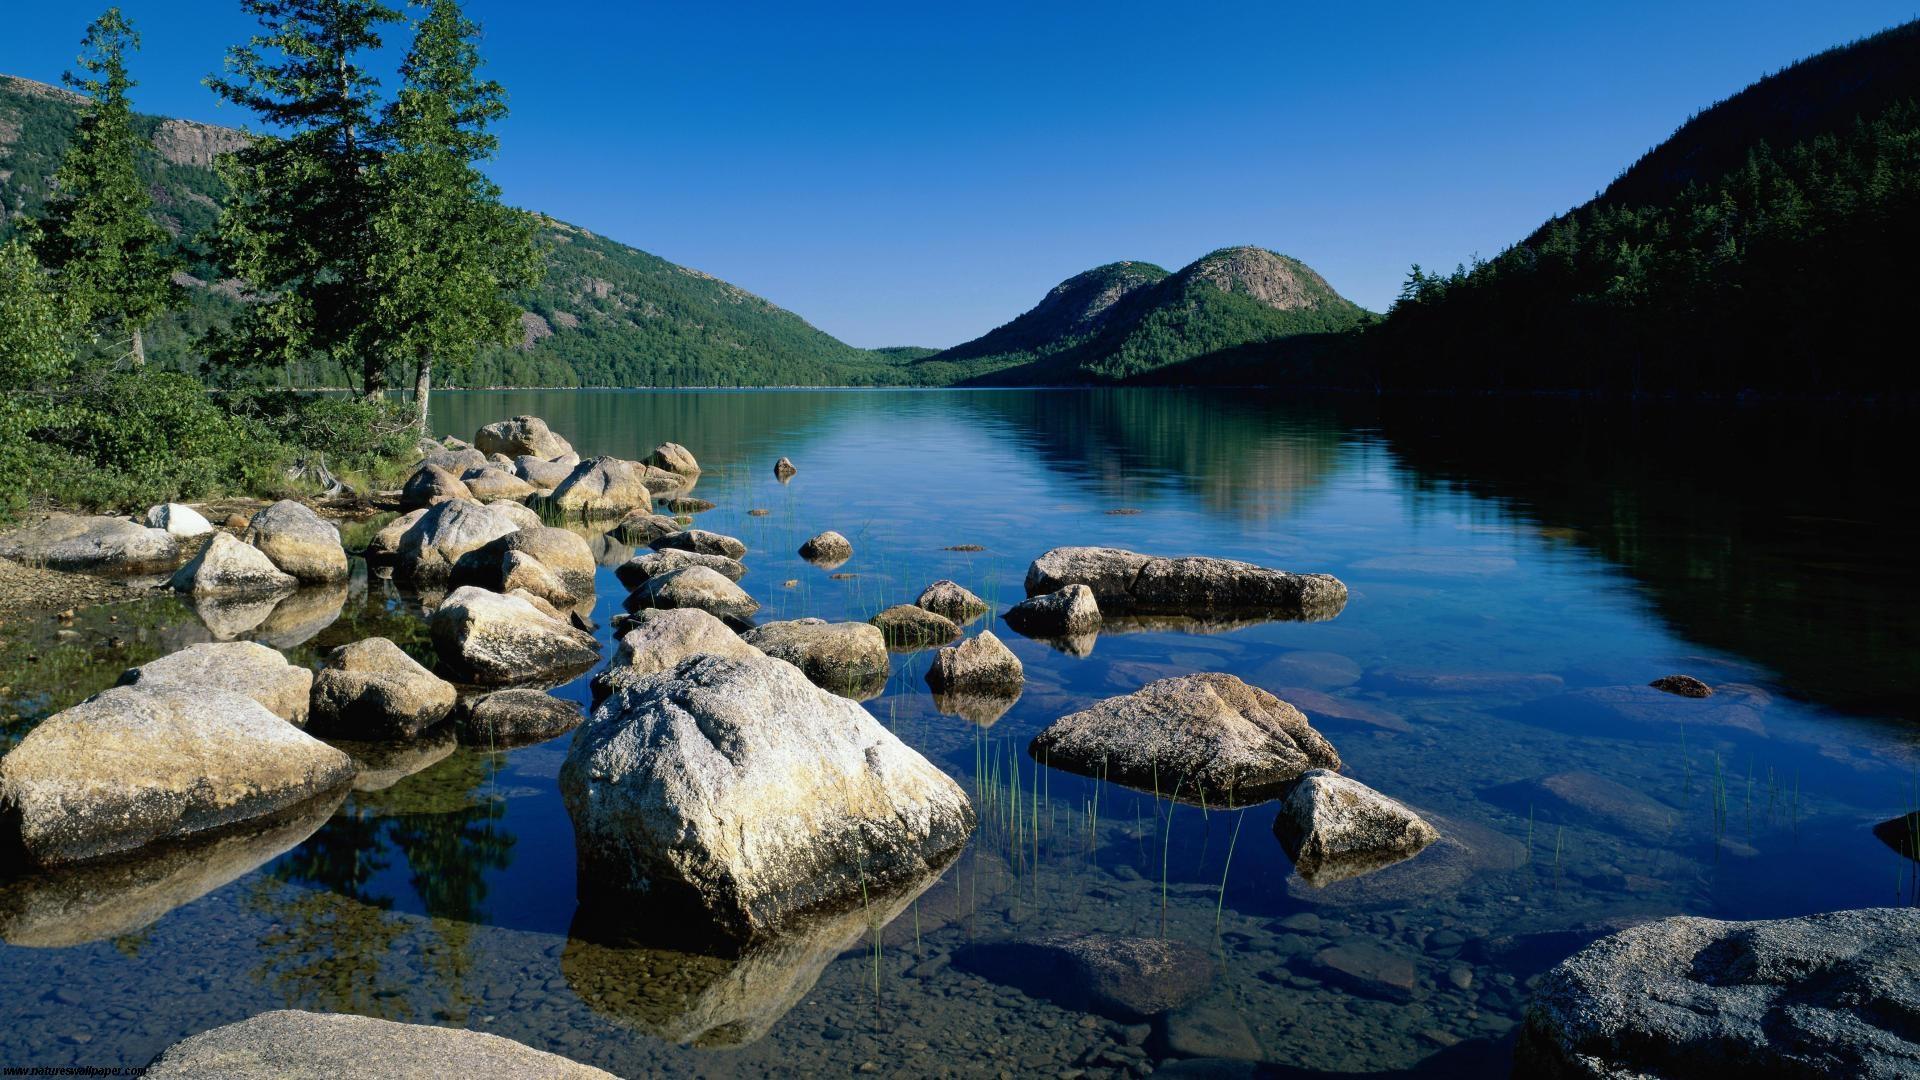 Jordan Pond Acadia National Park Maine 1920x1080